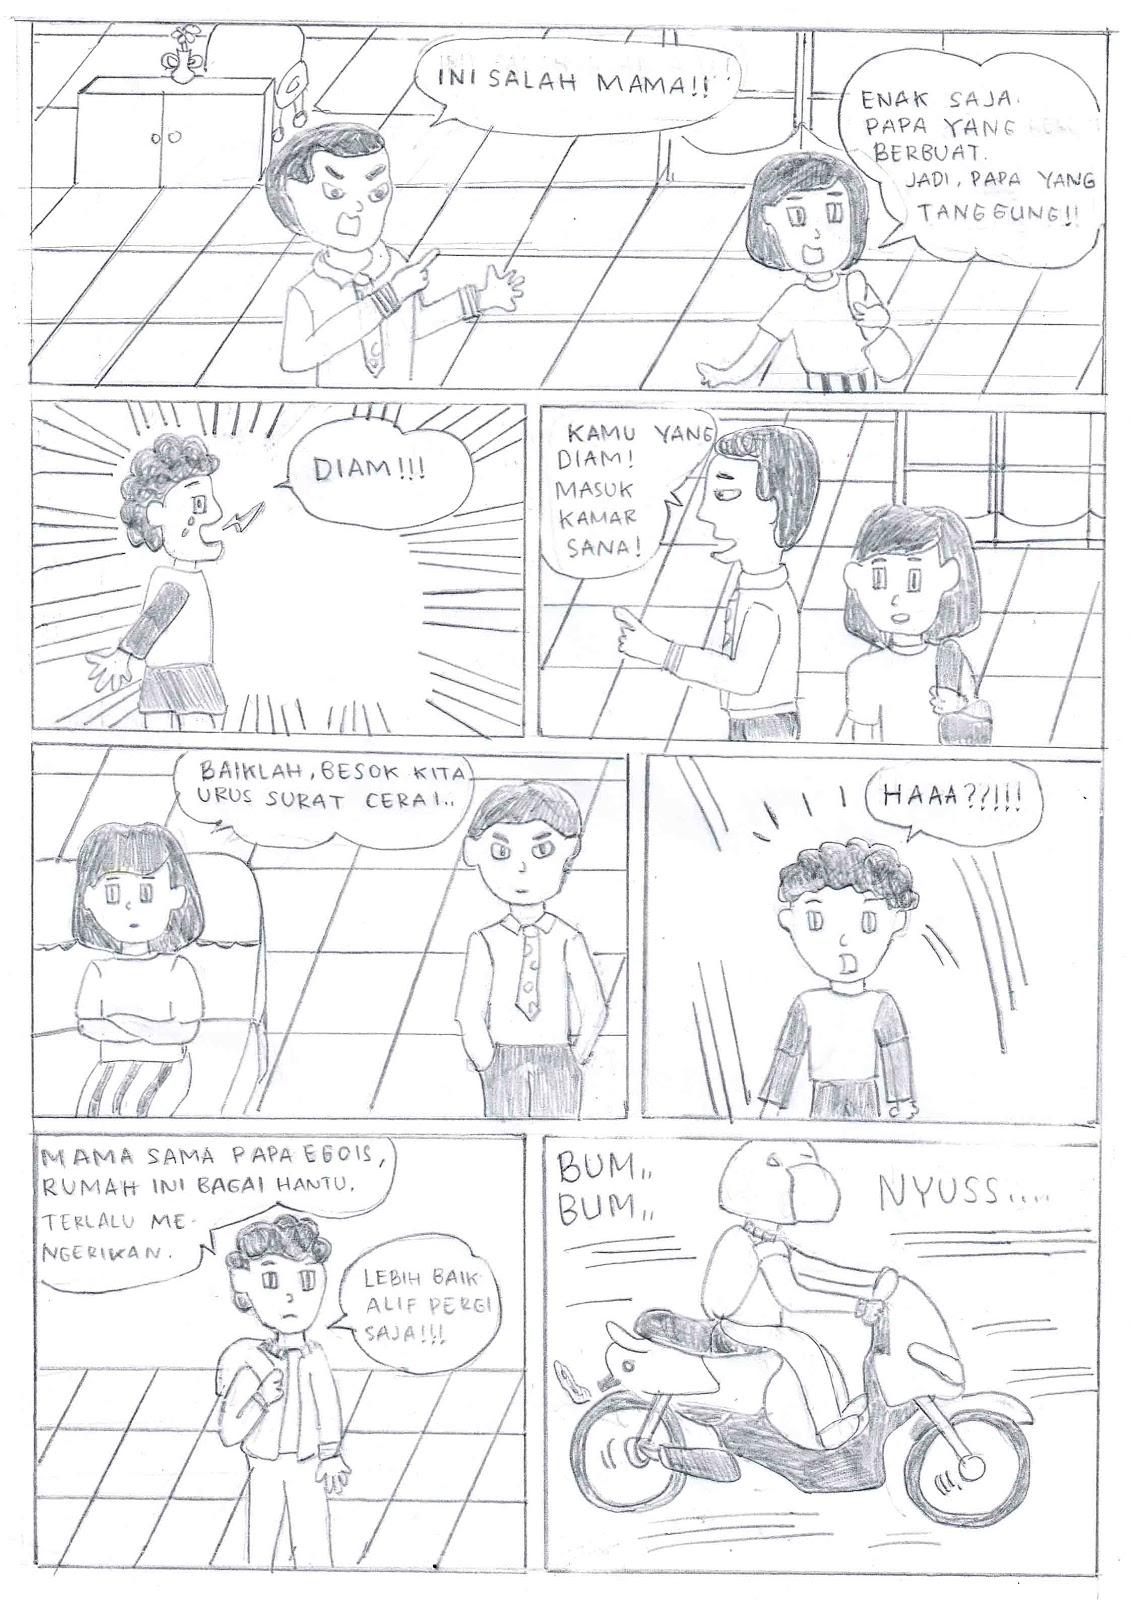 Komik Lucu Untuk Remaja  Kolektor Lucu